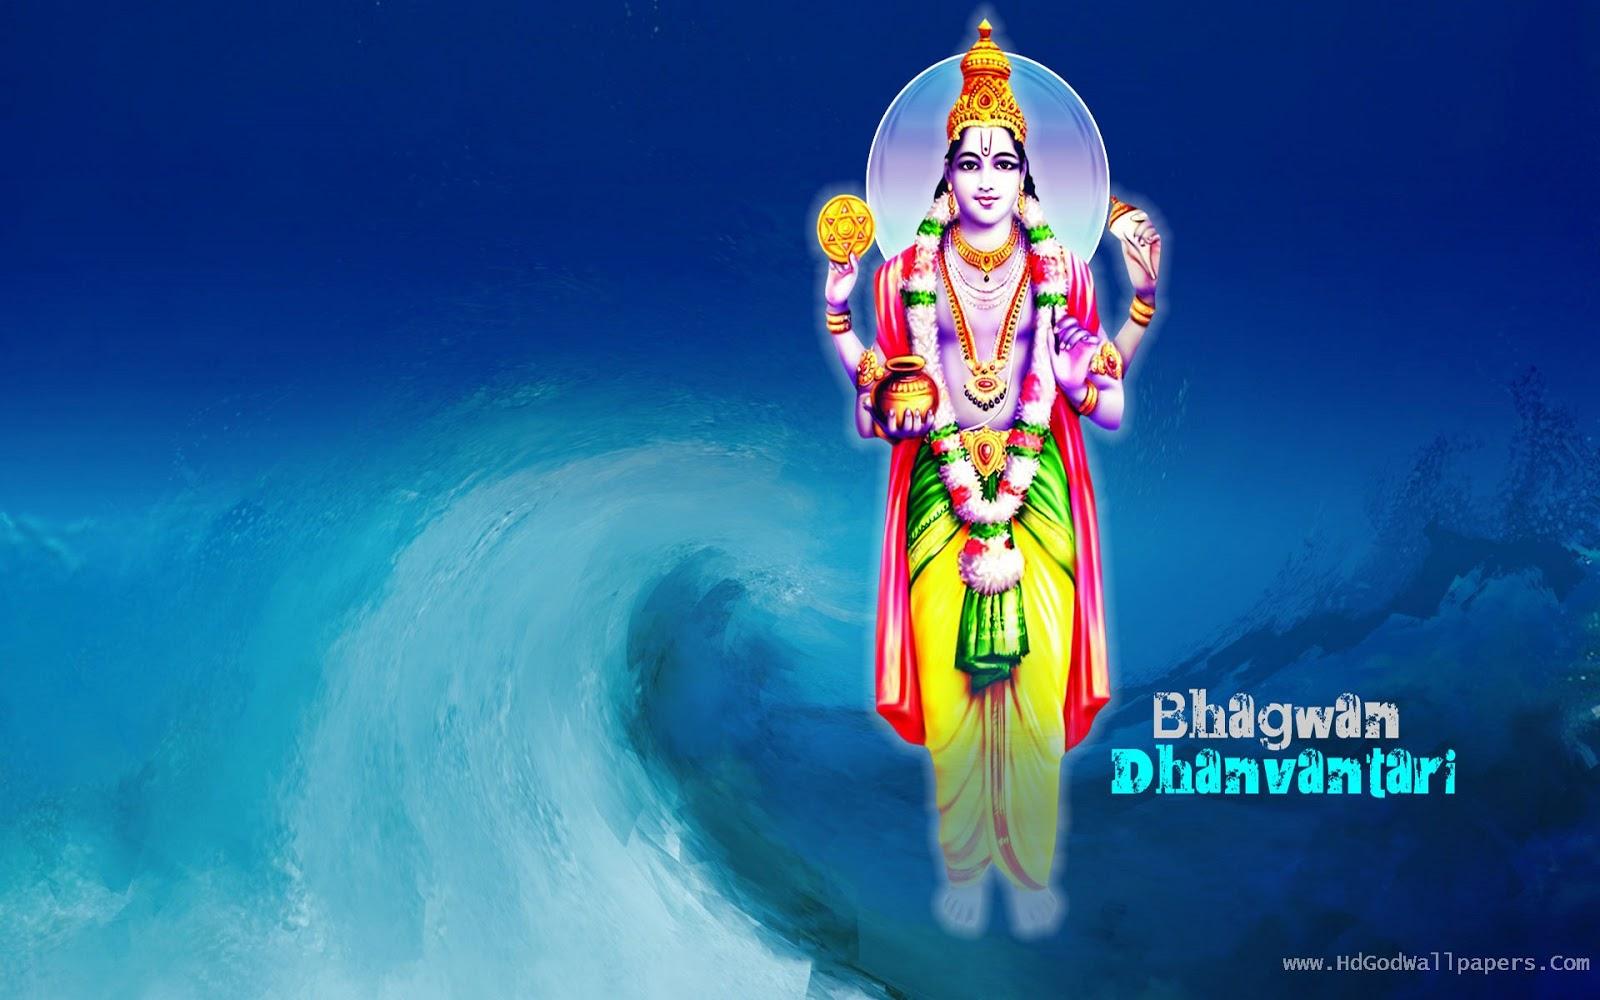 God Dhanvantari HD Wallpapers Pictures